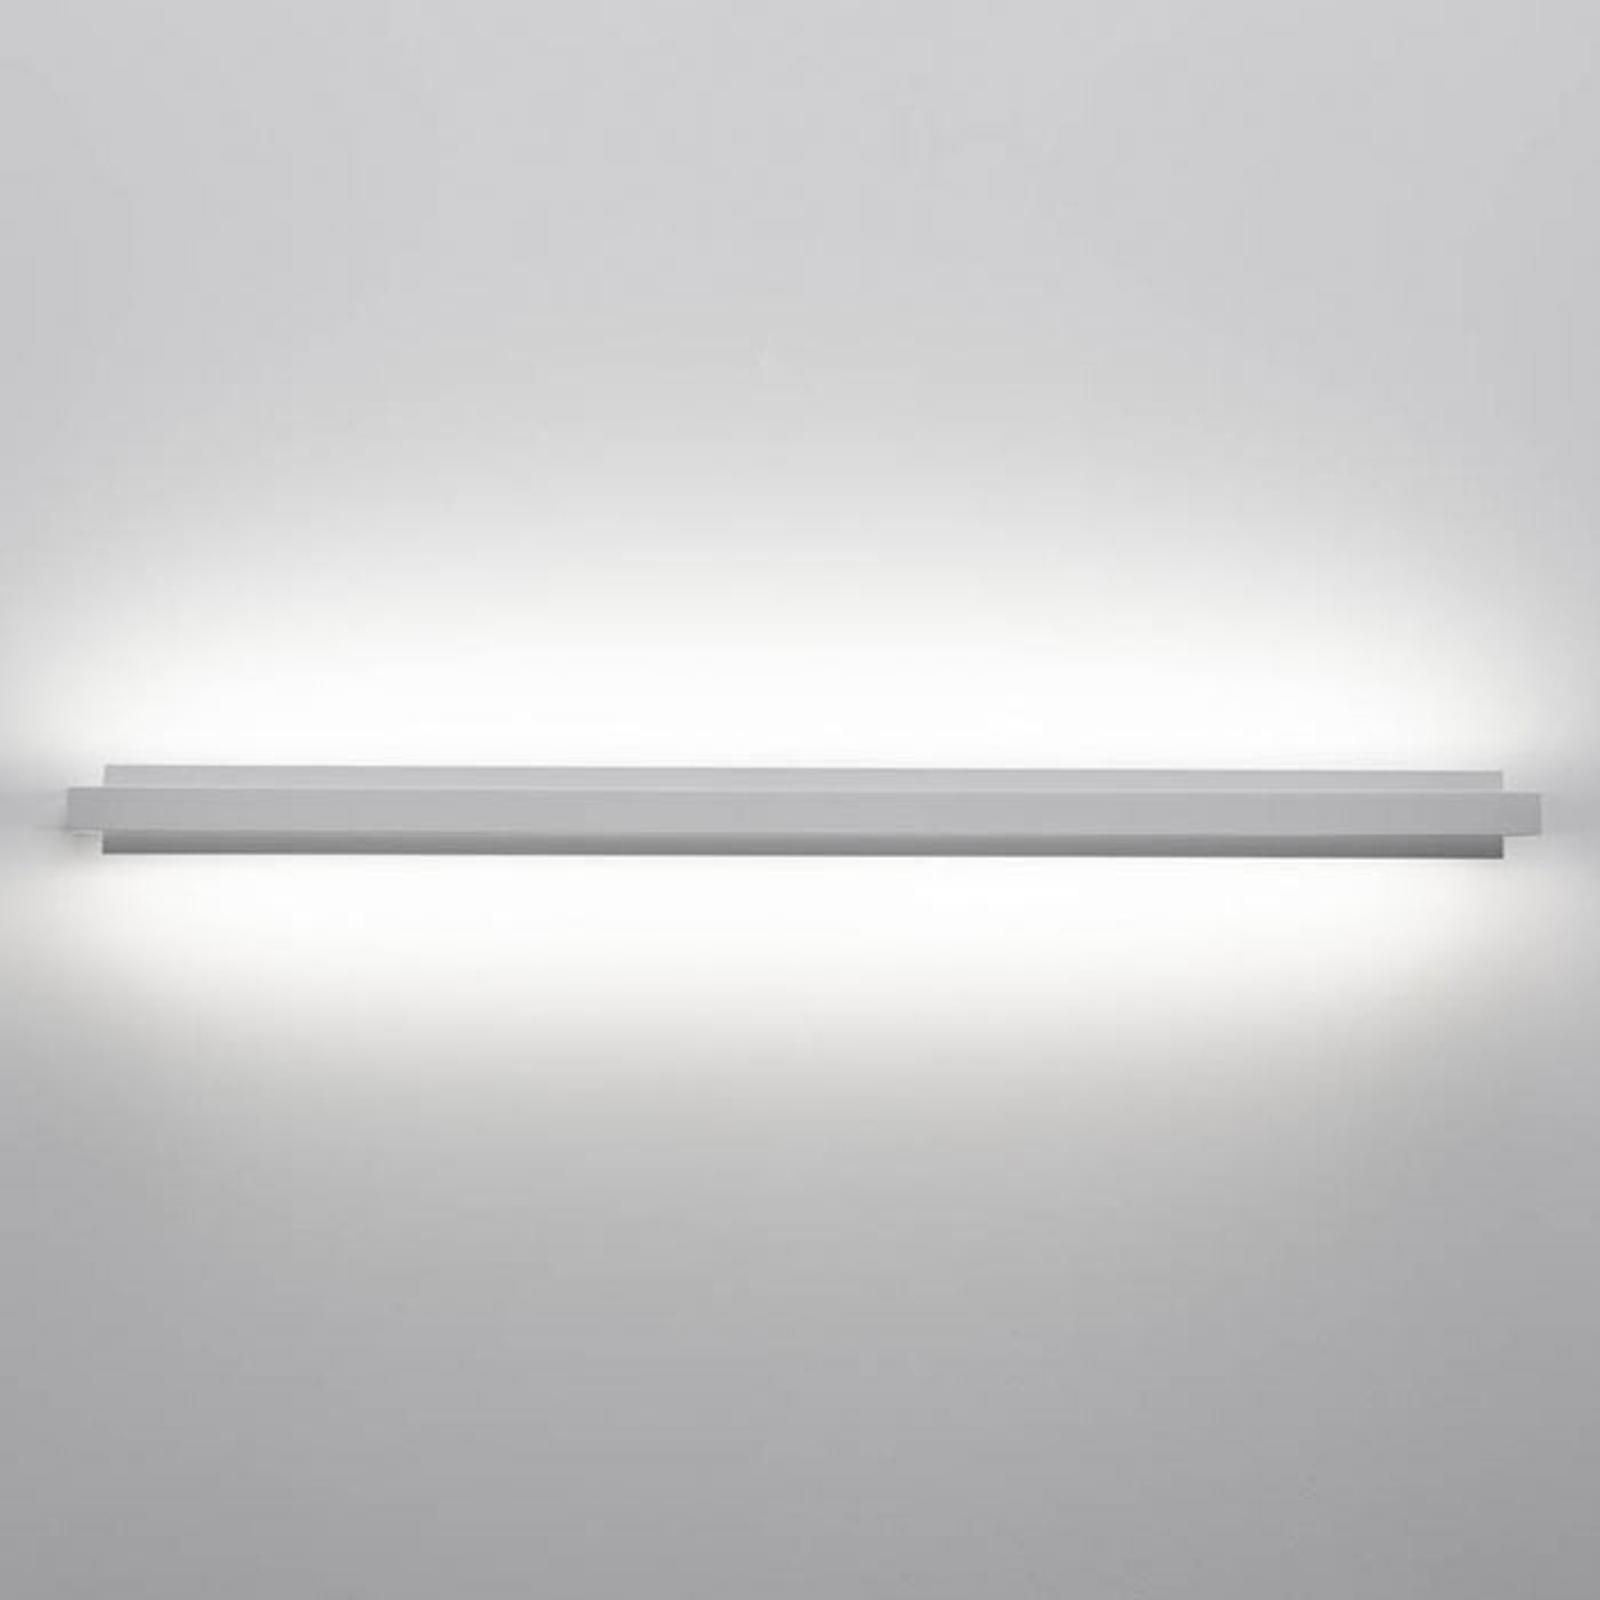 Acquista Applique LED Tablet W1 larga 66 cm, bianca